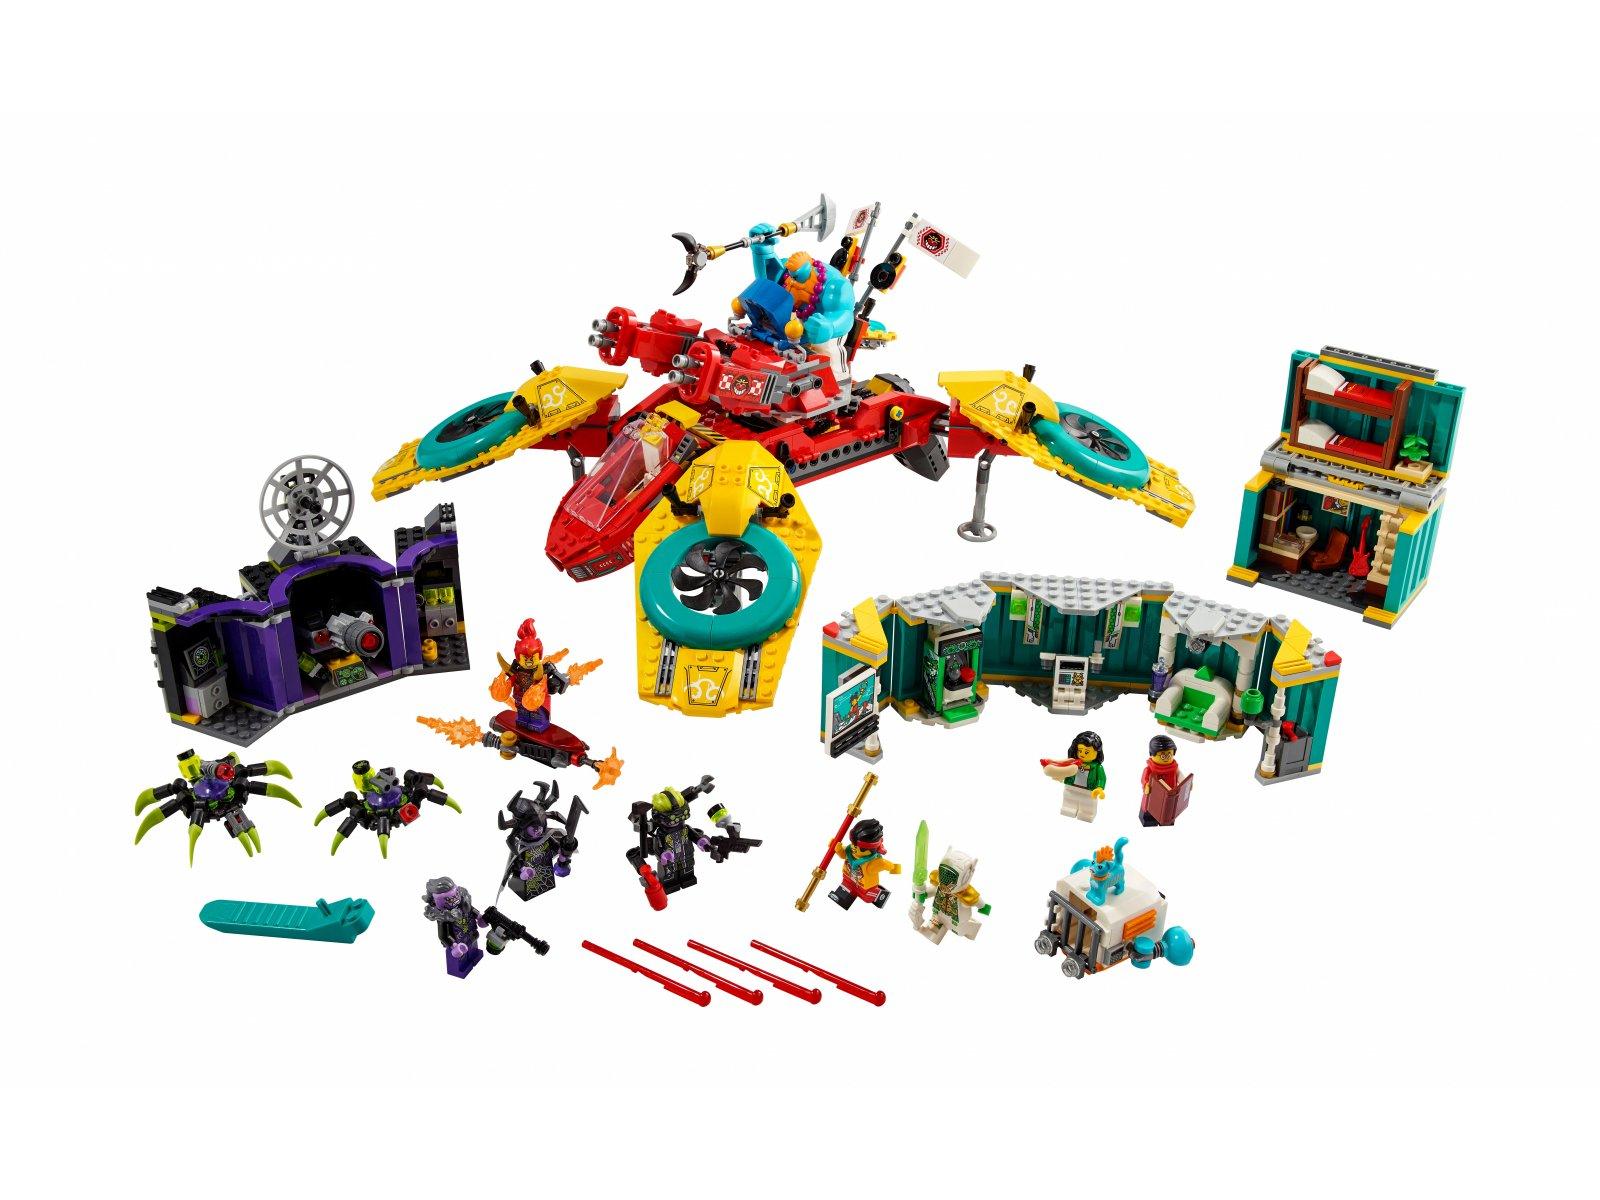 LEGO Monkie Kid Dronkopter ekipy Monkie Kida 80023